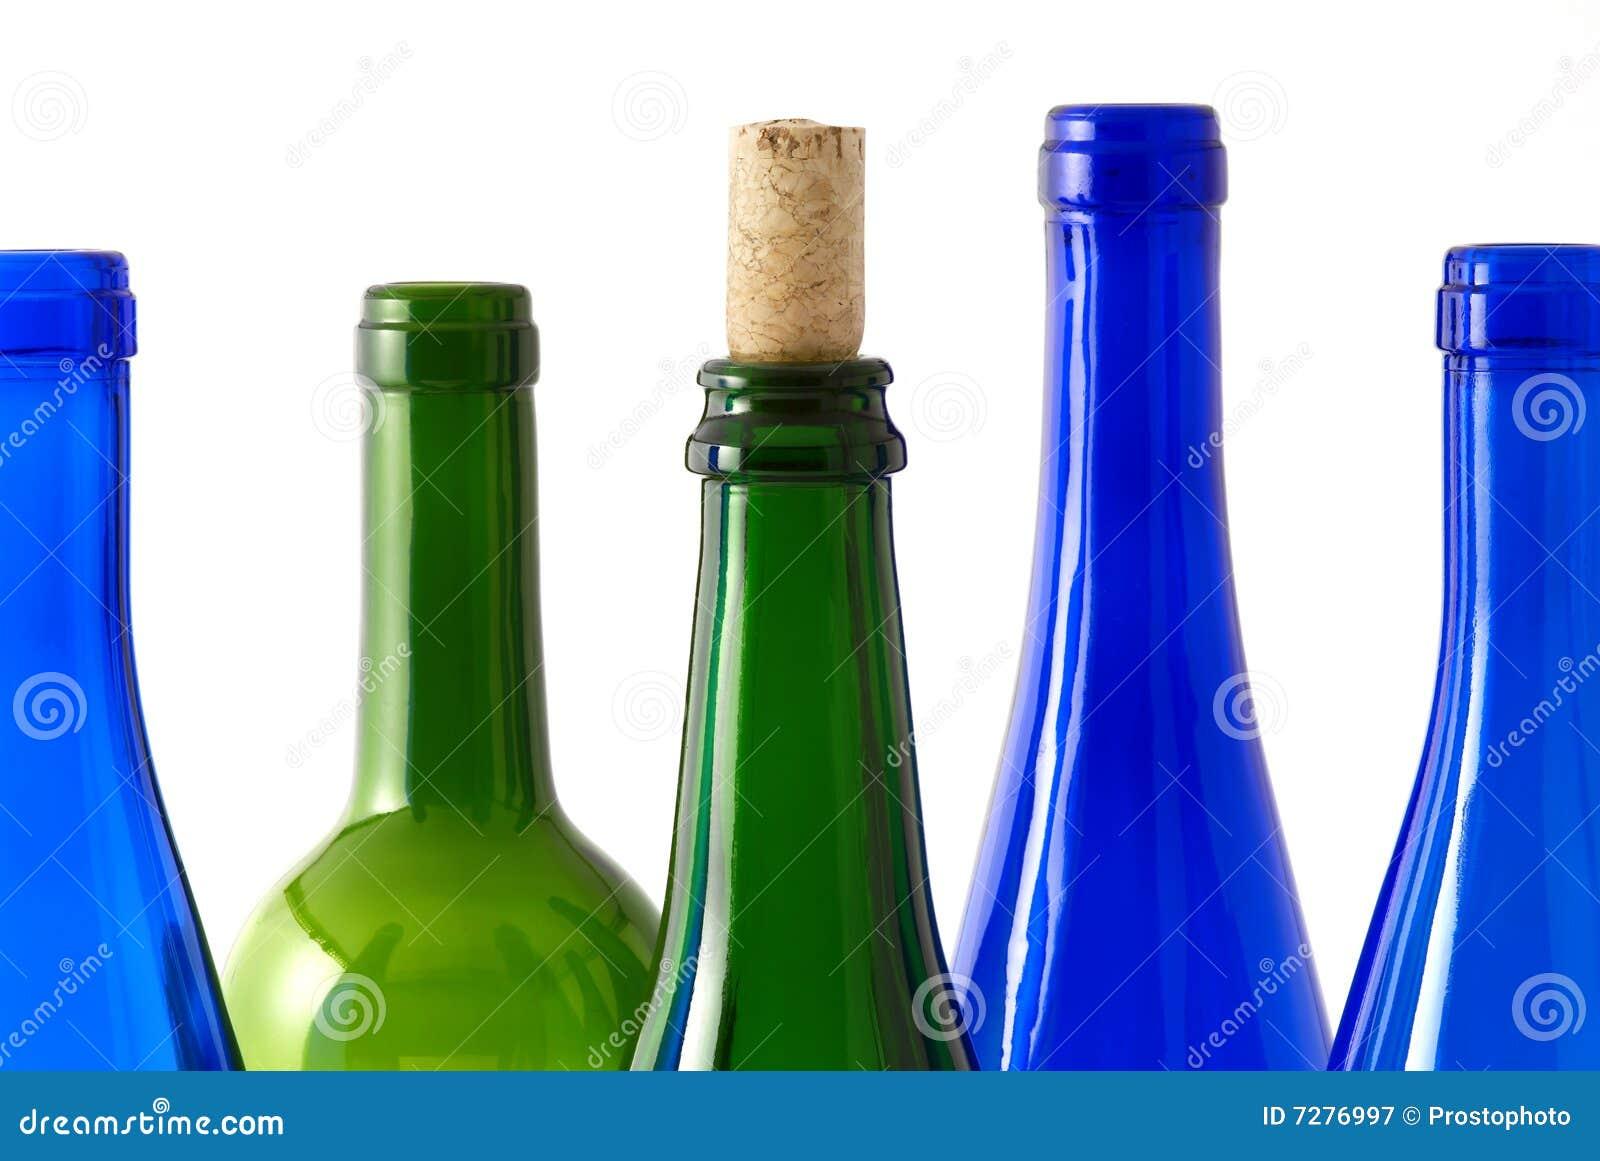 Botellas de vino transpatent del color